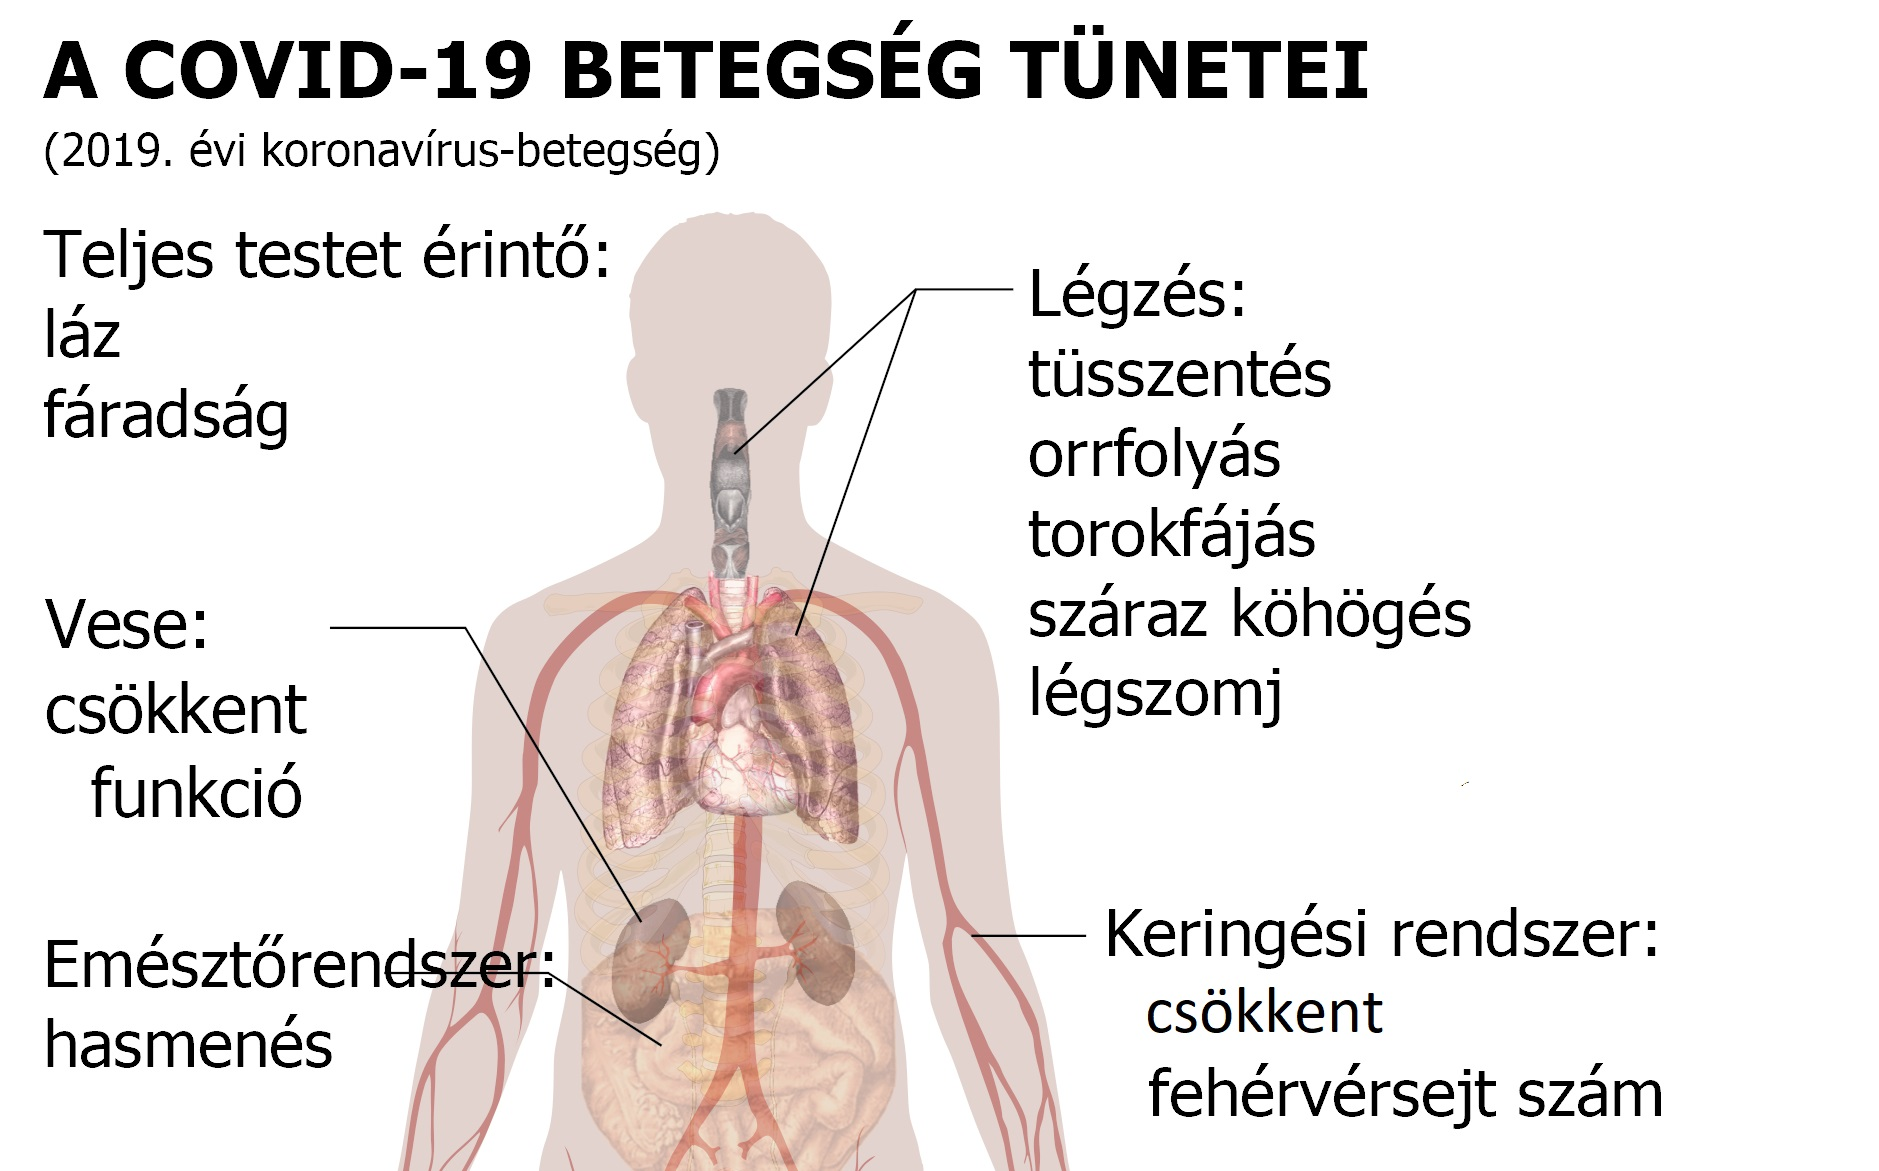 a magas vérnyomás és a magas vérnyomás azonos és a magas vérnyomás társult betegség